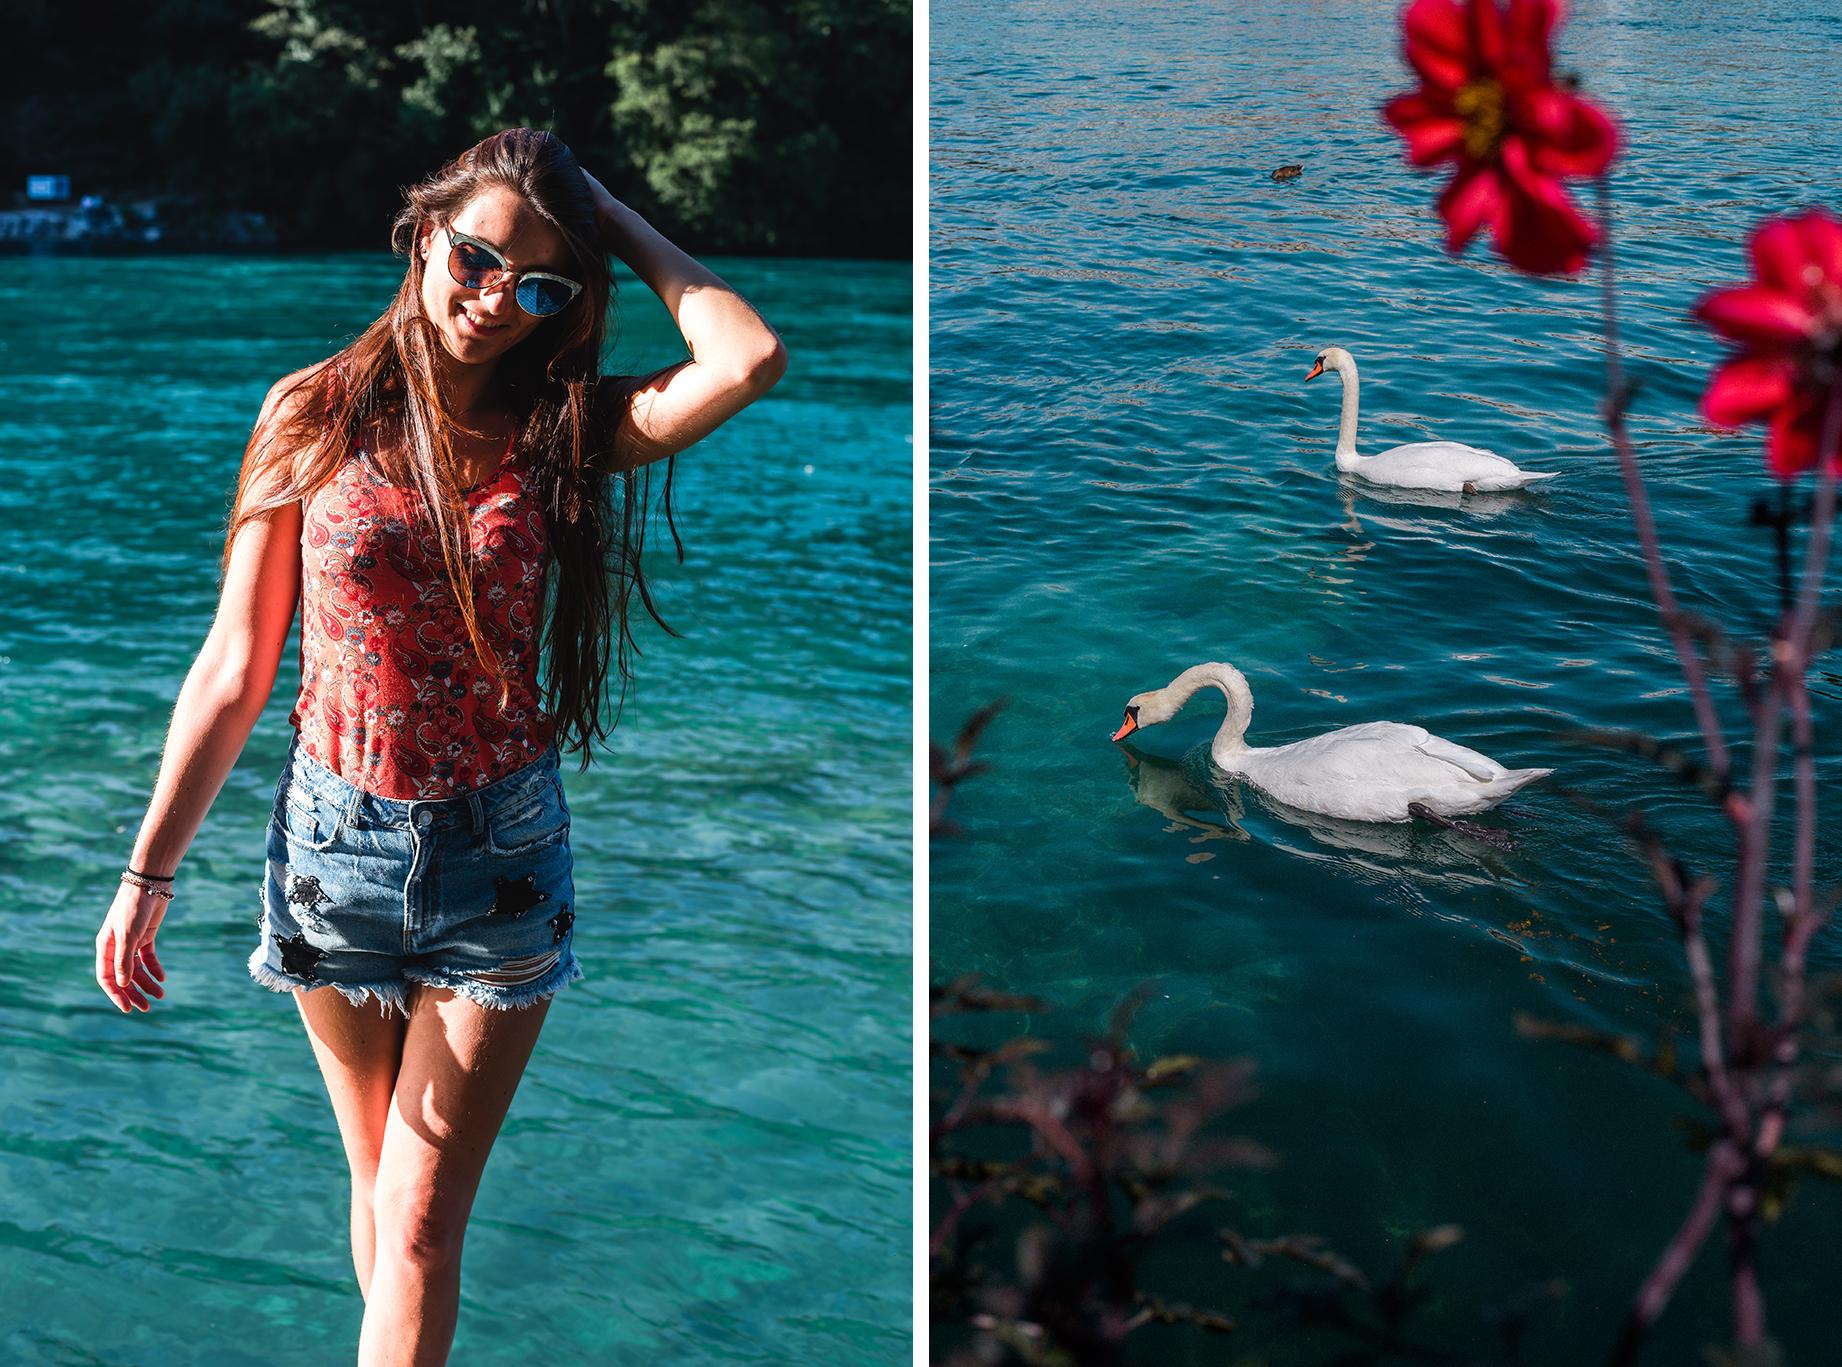 Nager dans le Rhône, Genève